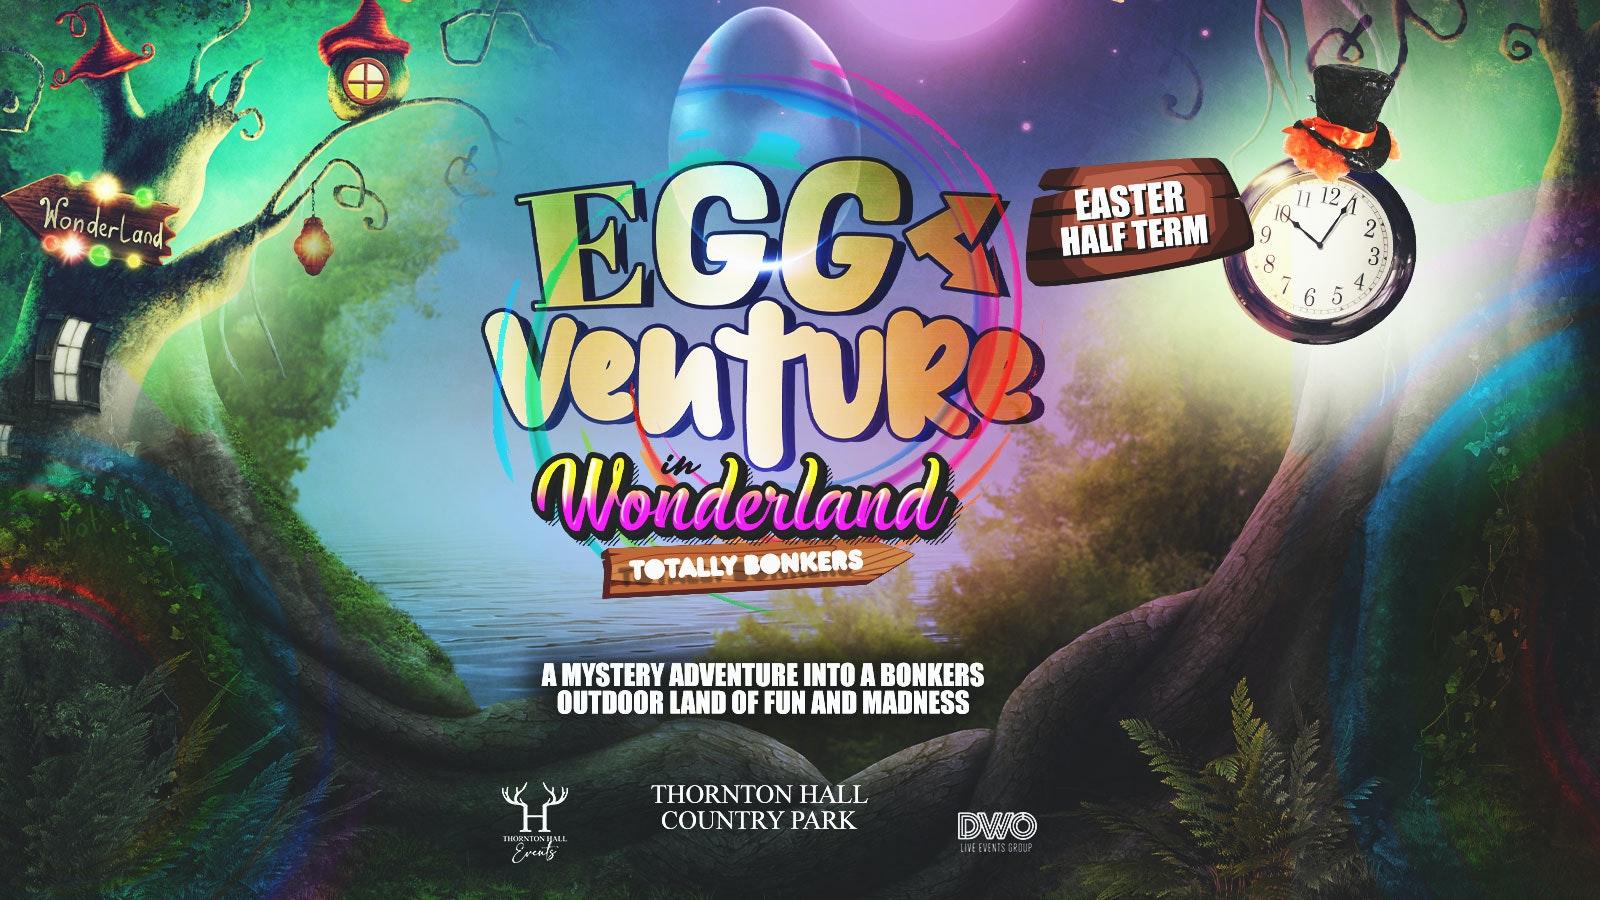 EggVenture in Wonderland – Friday 9th April – 2pm